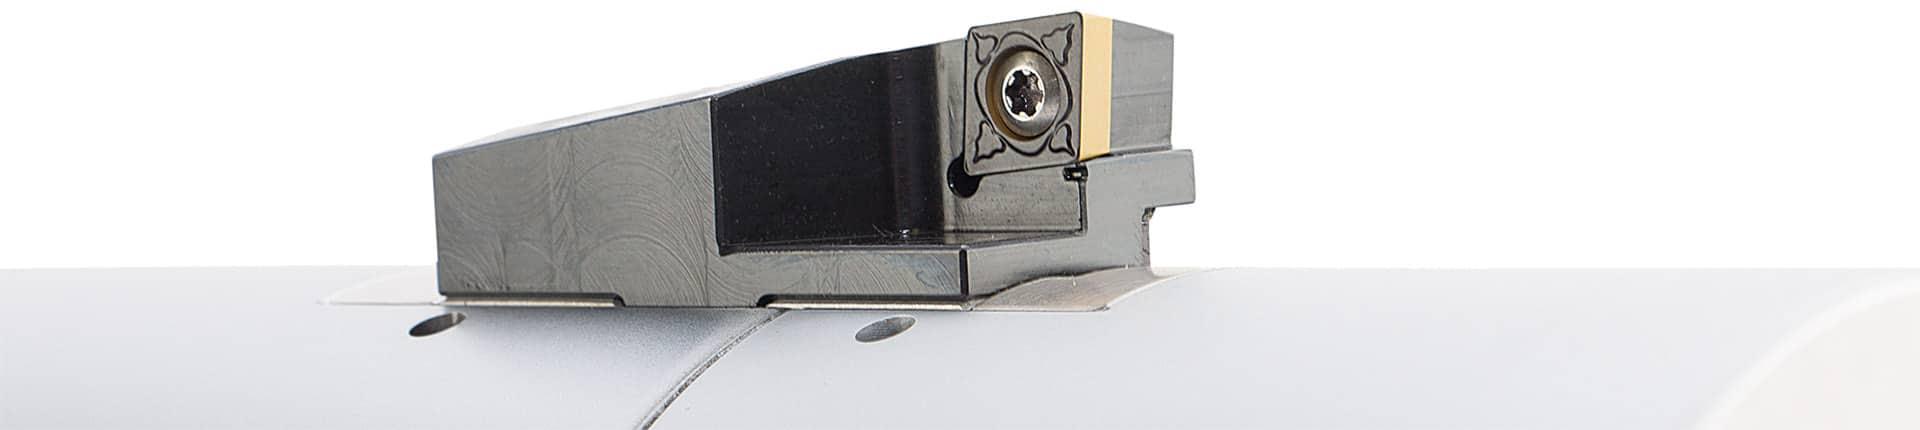 cartridge pocket close